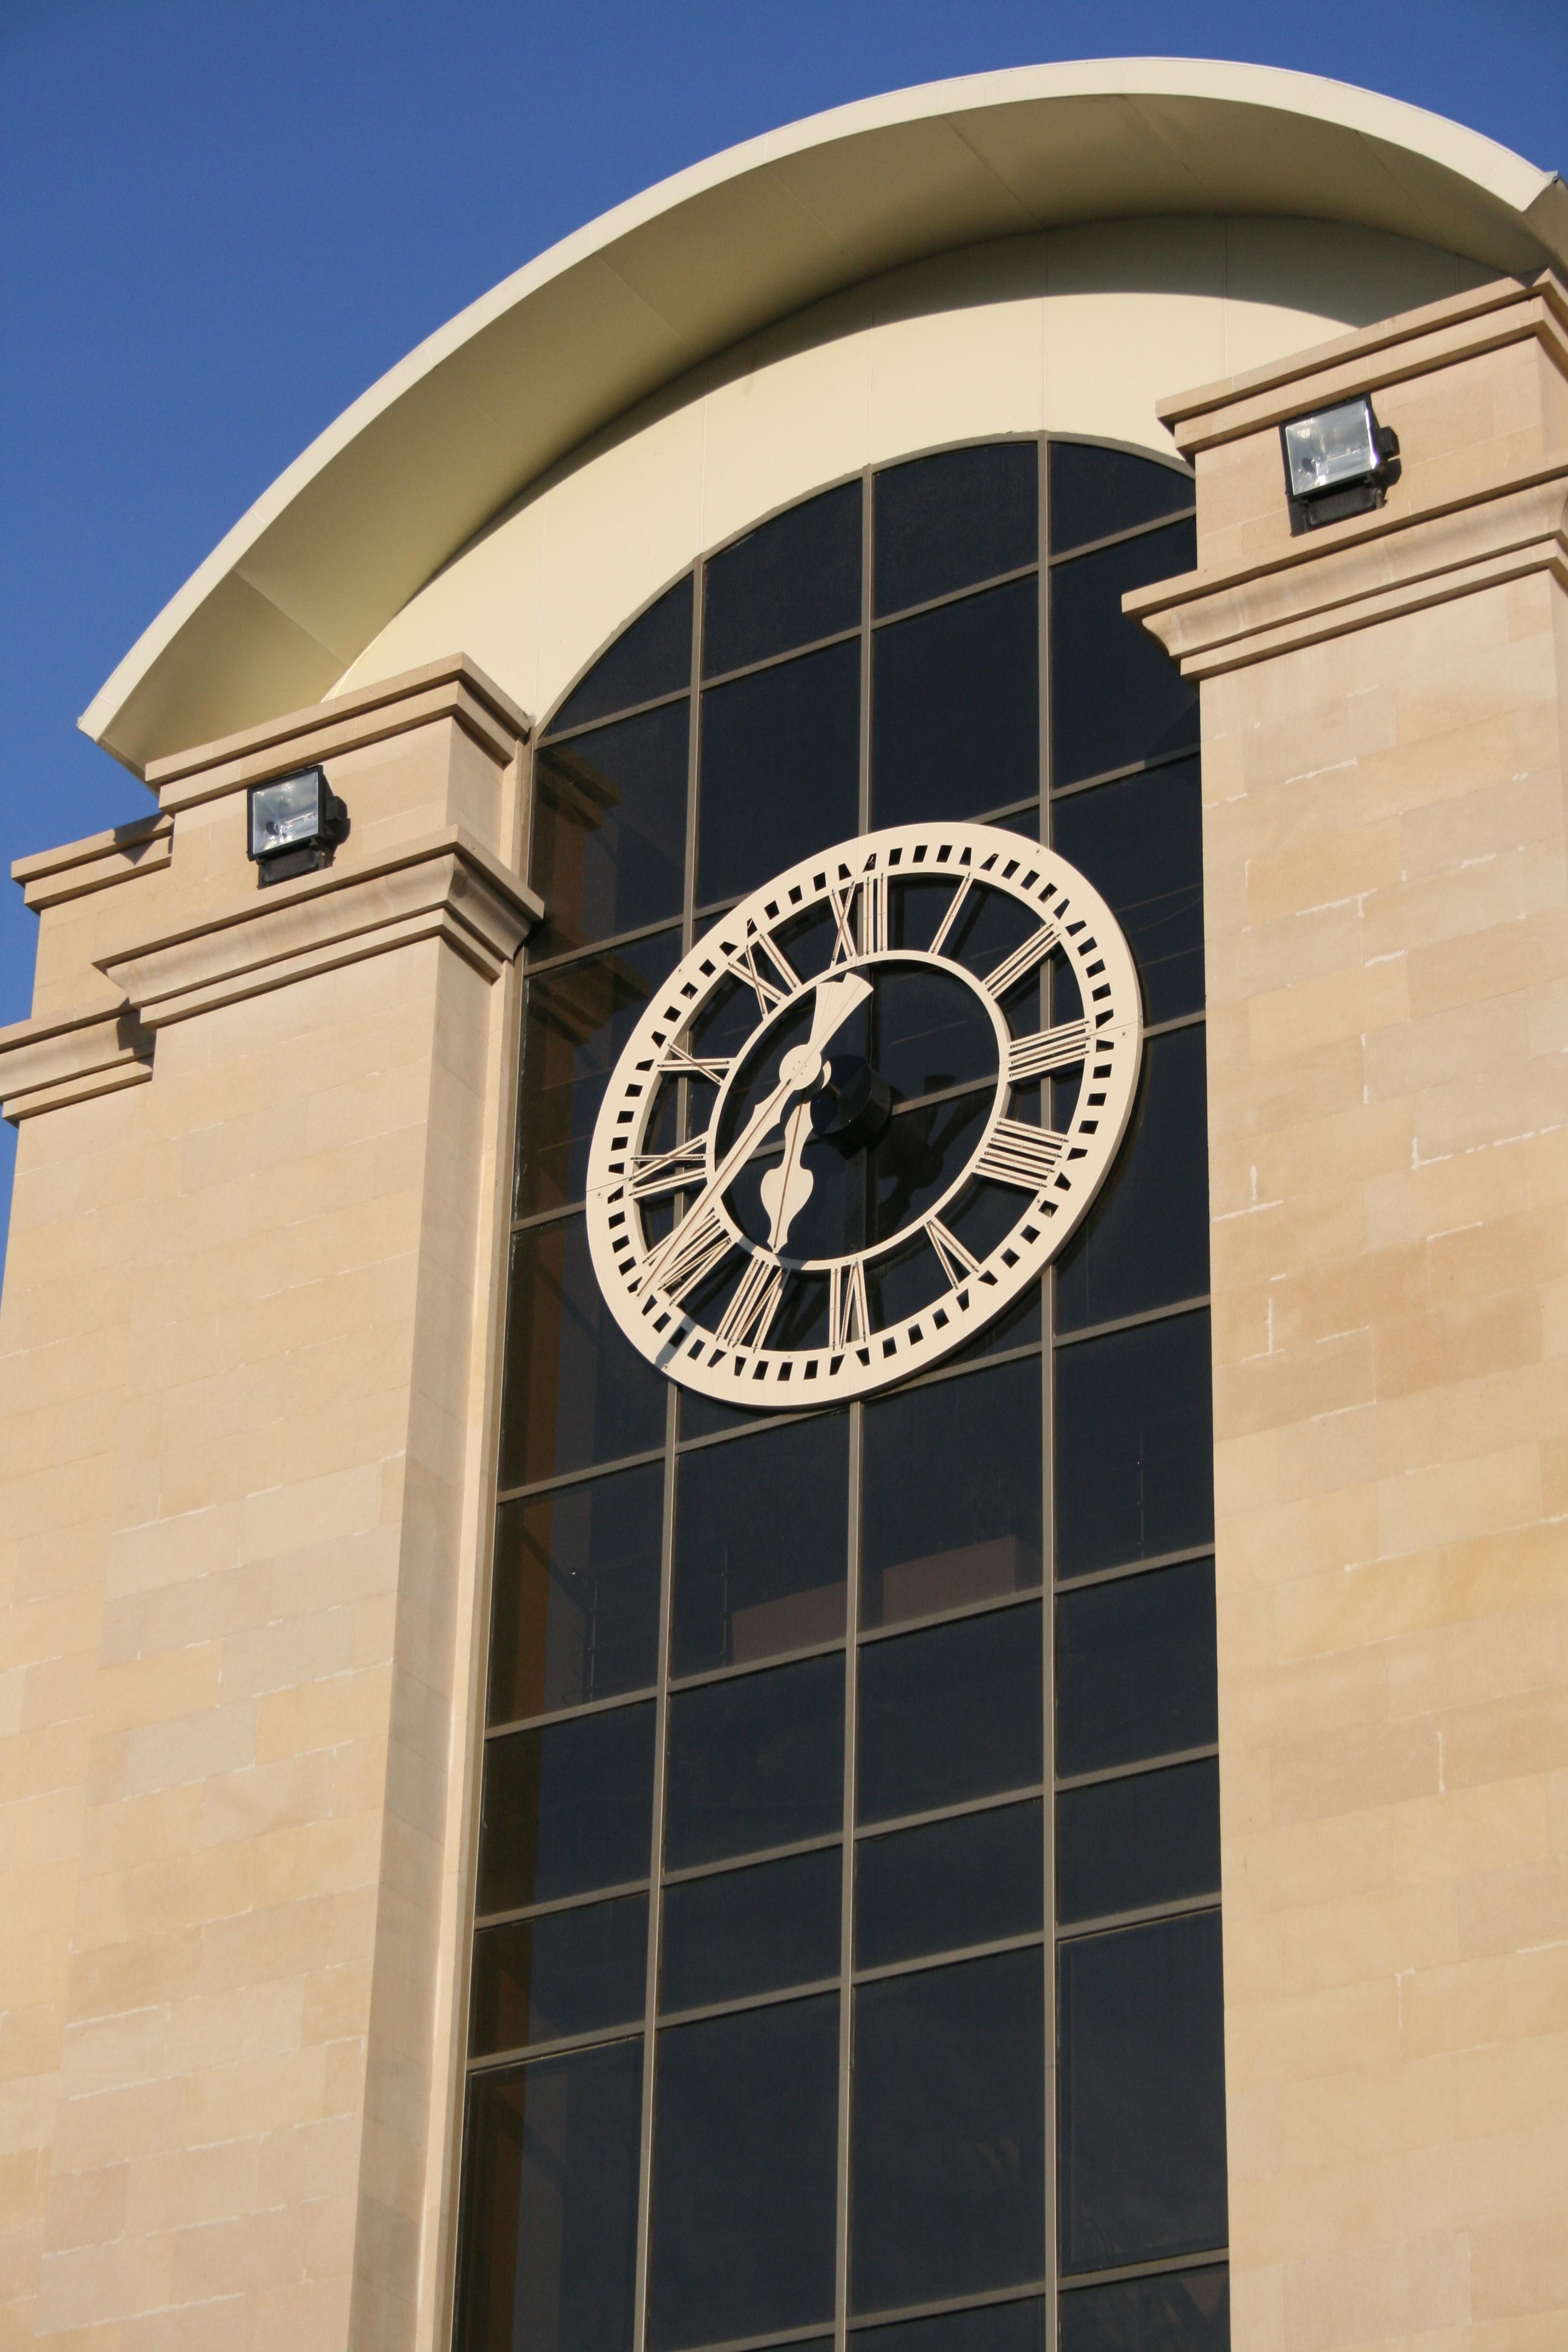 Neptune Street Furniture Street Furniture Architectural Features Exterior Clock